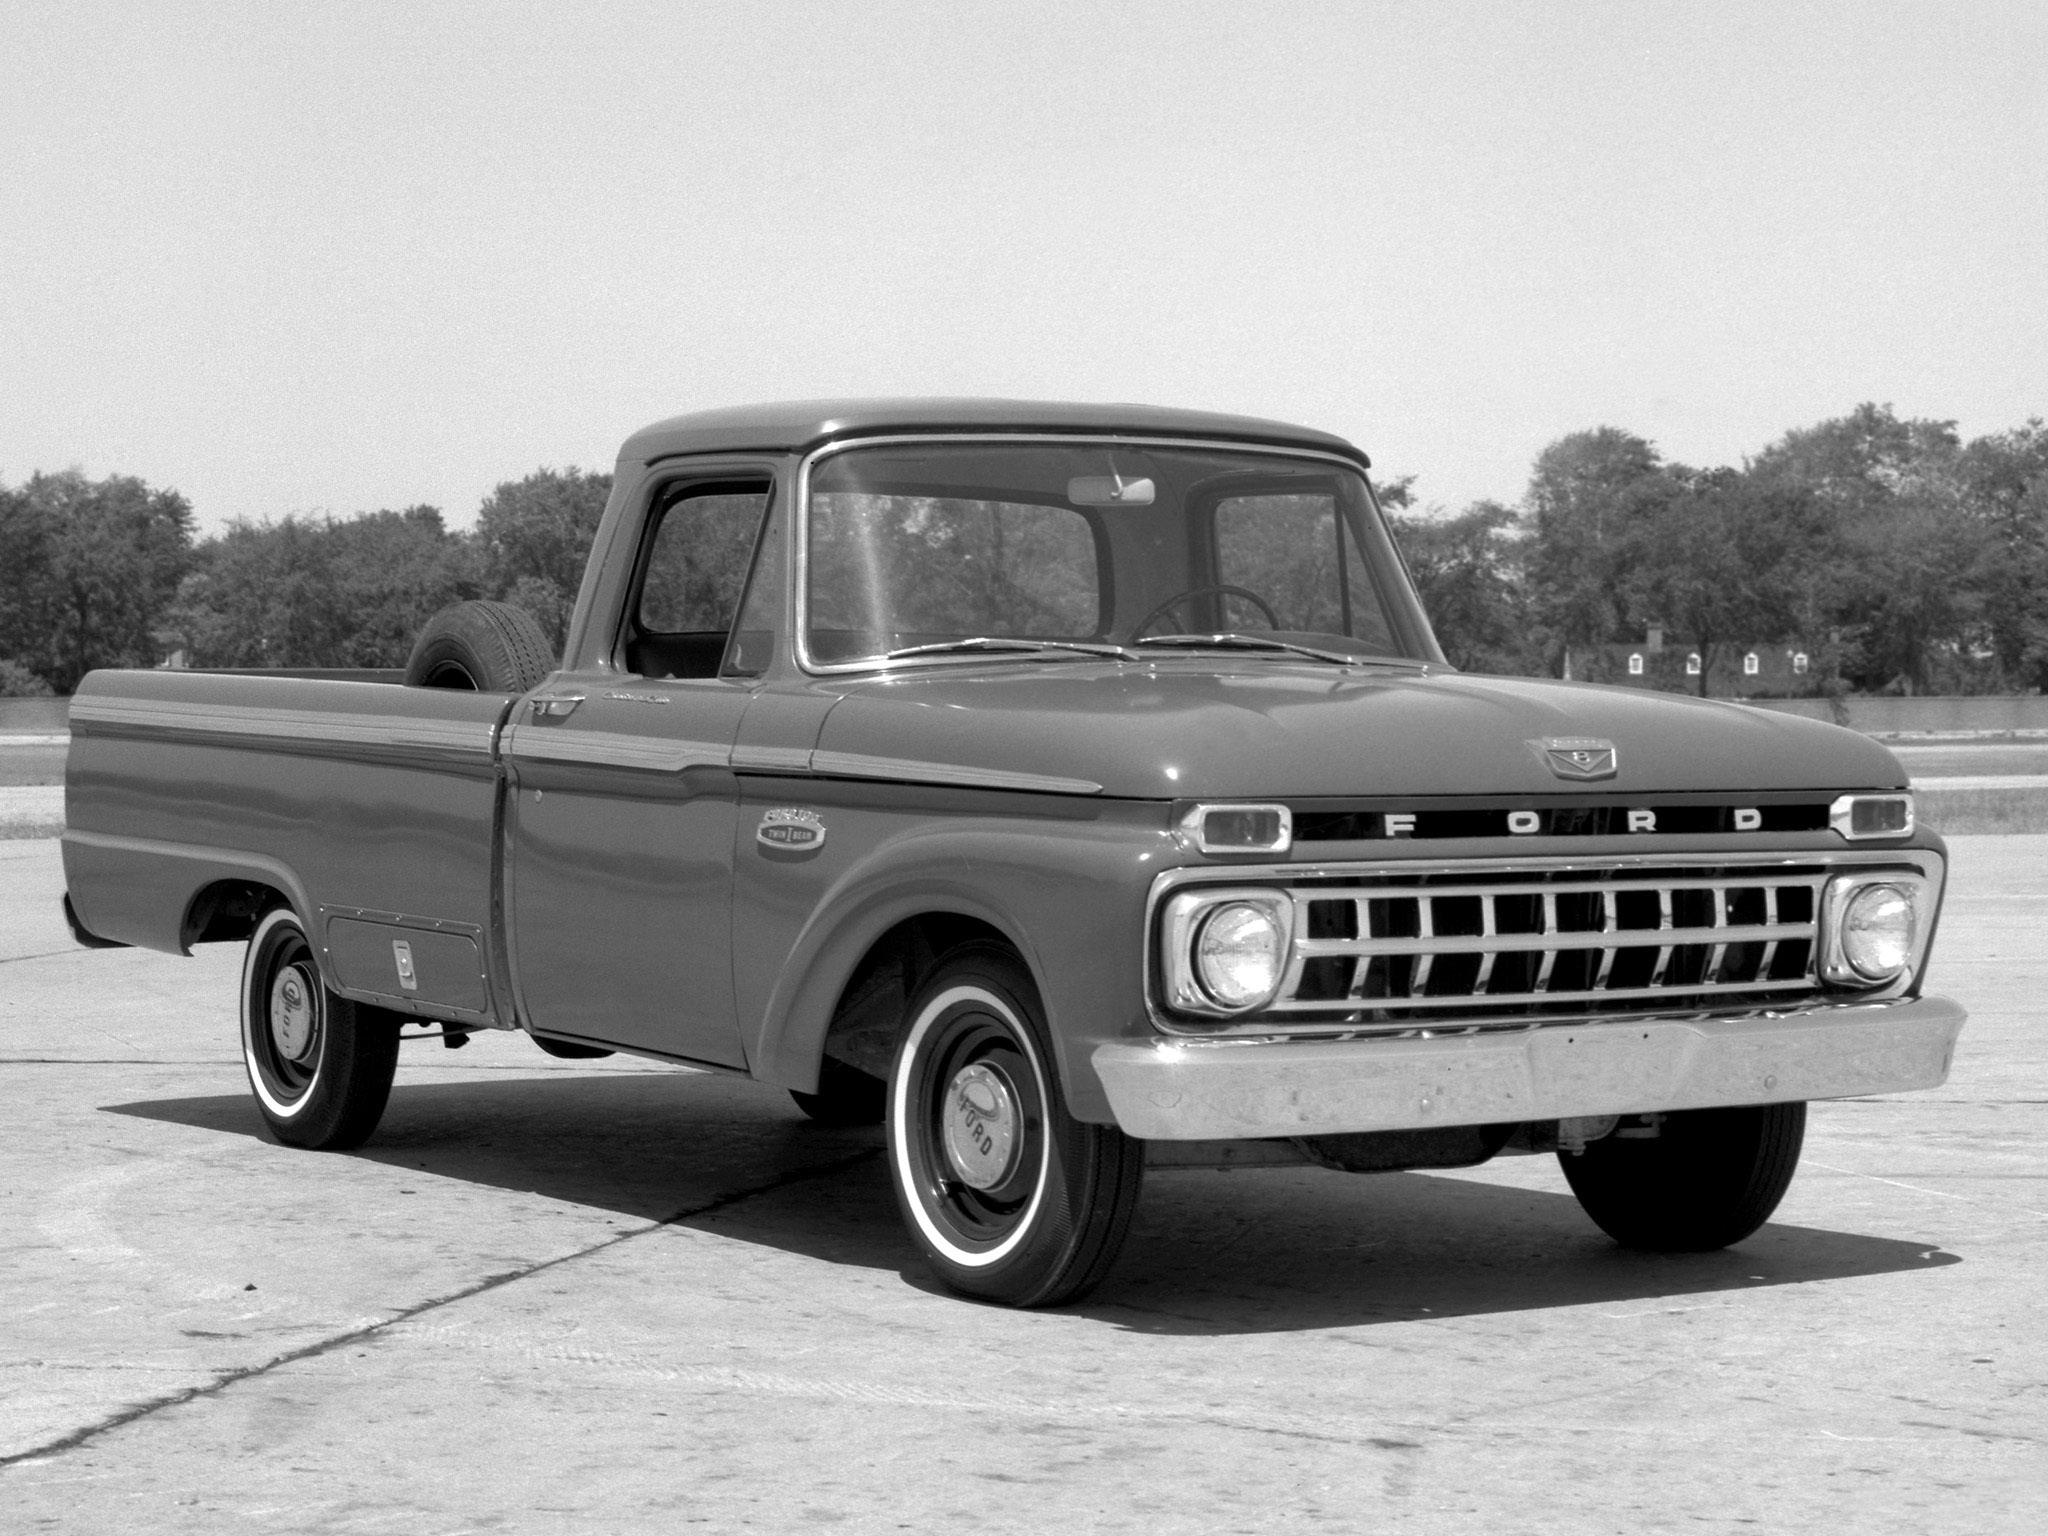 classic ford truck wallpaper wallpapersafari. Black Bedroom Furniture Sets. Home Design Ideas